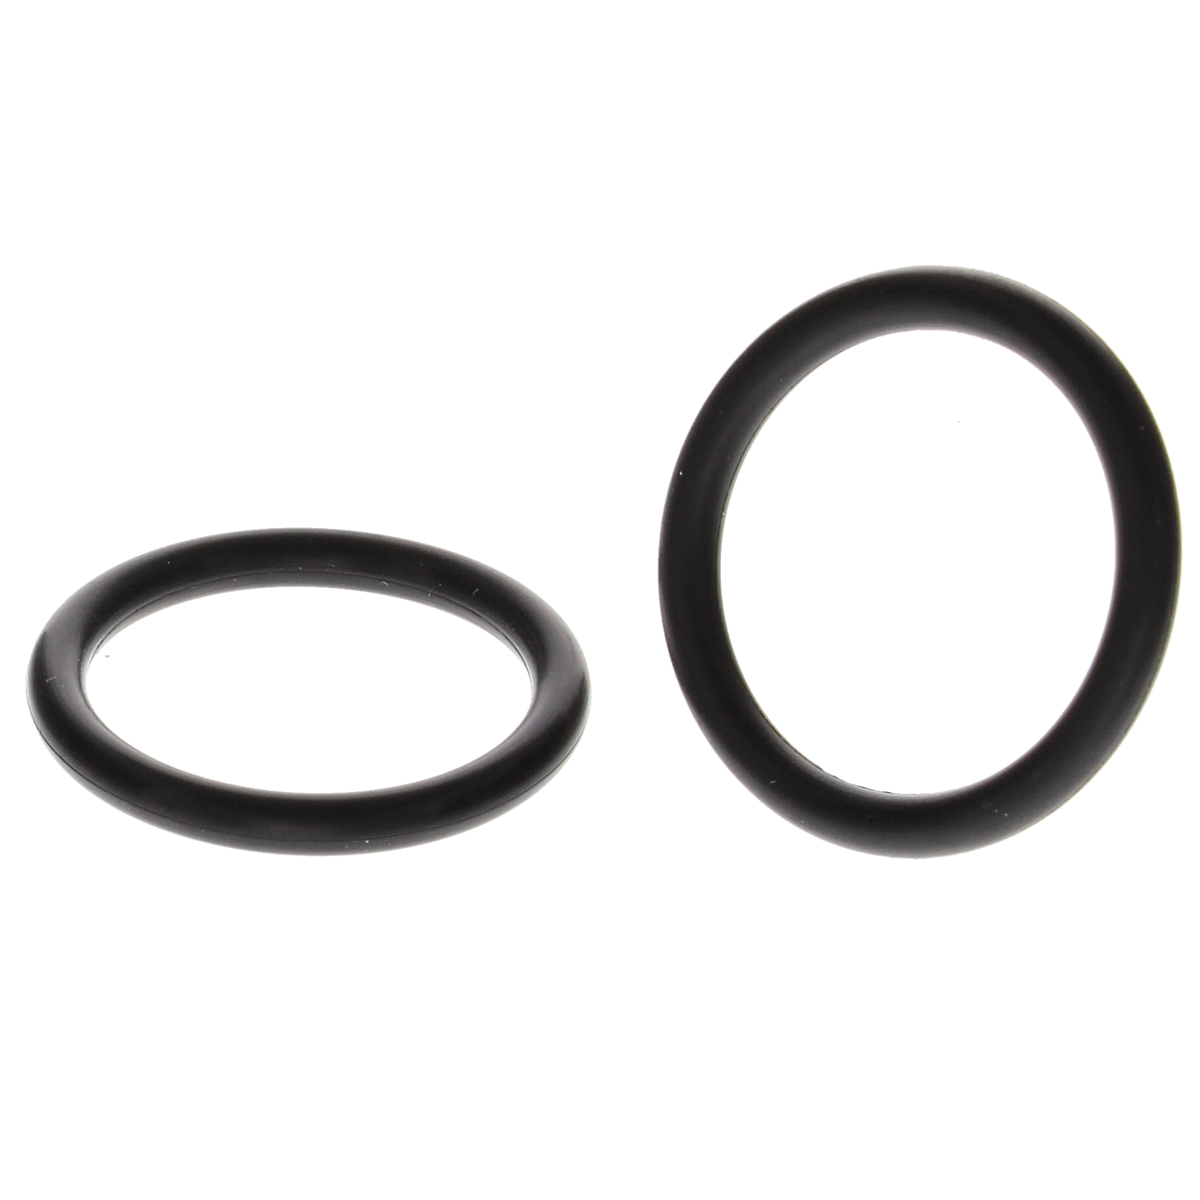 "1-1/8"" ID x 1-3/8"" OD x 1/8"" O-Rings, 25/PKG"